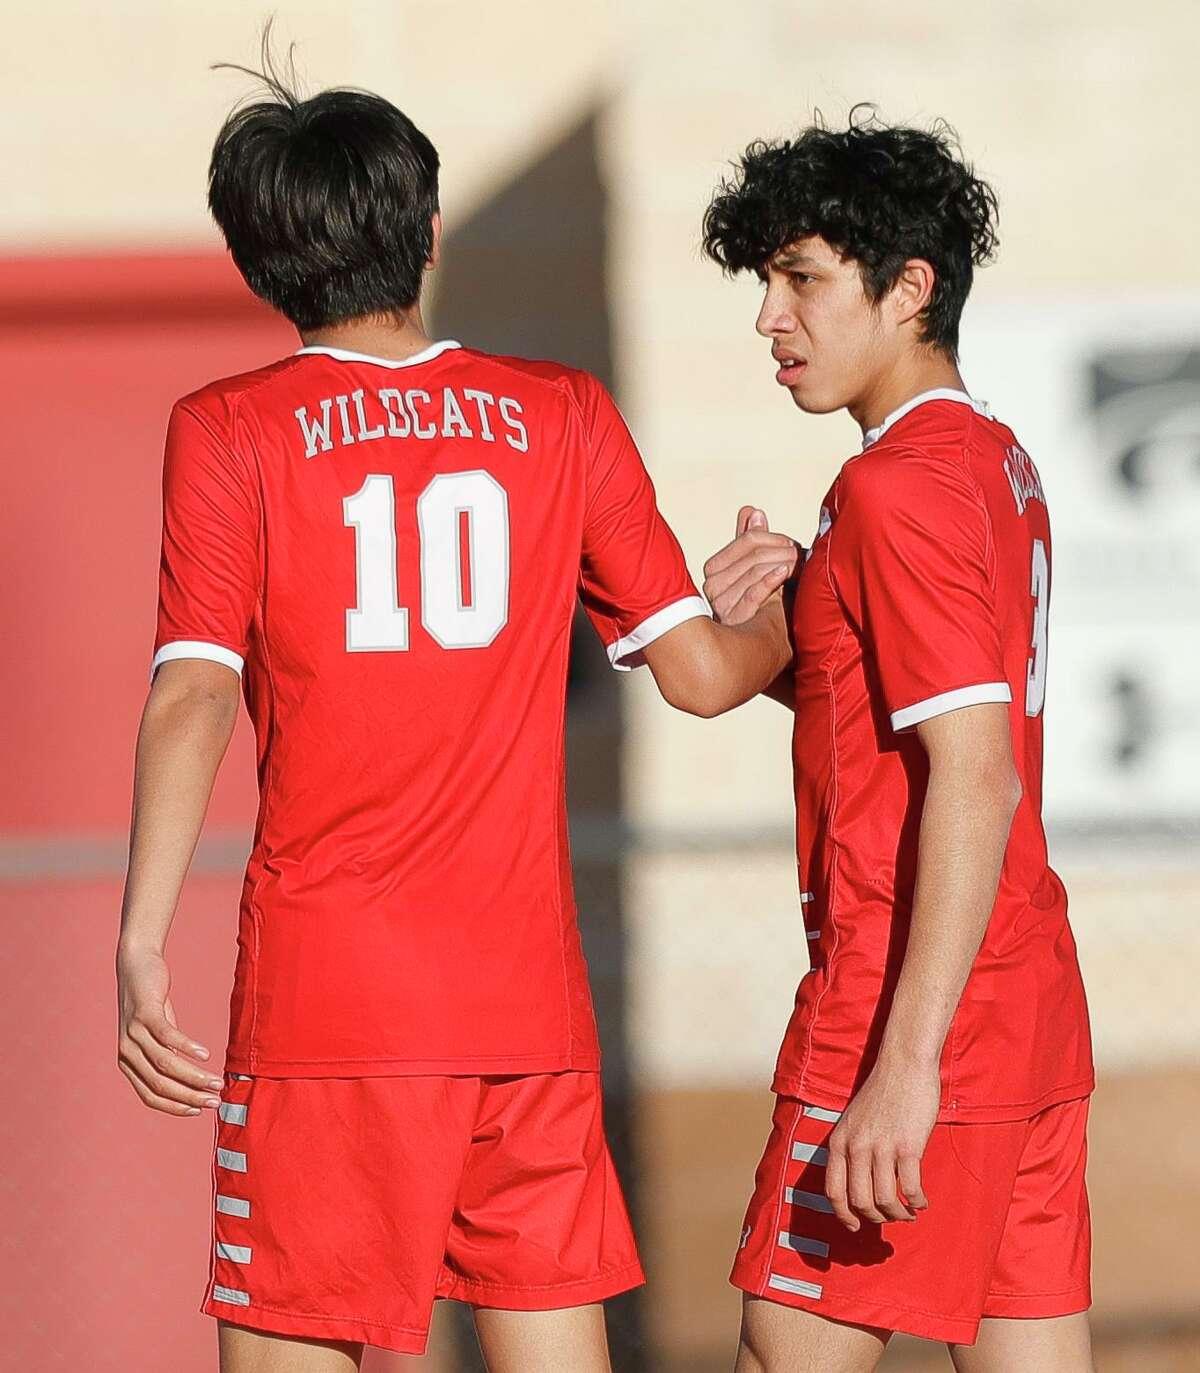 Shown here earlier this month, Splendora's Eduardo Avellanedo, right, and Baruc Delgado (10) each scored a goal in a 2-0 win over Huffman-Hargrave